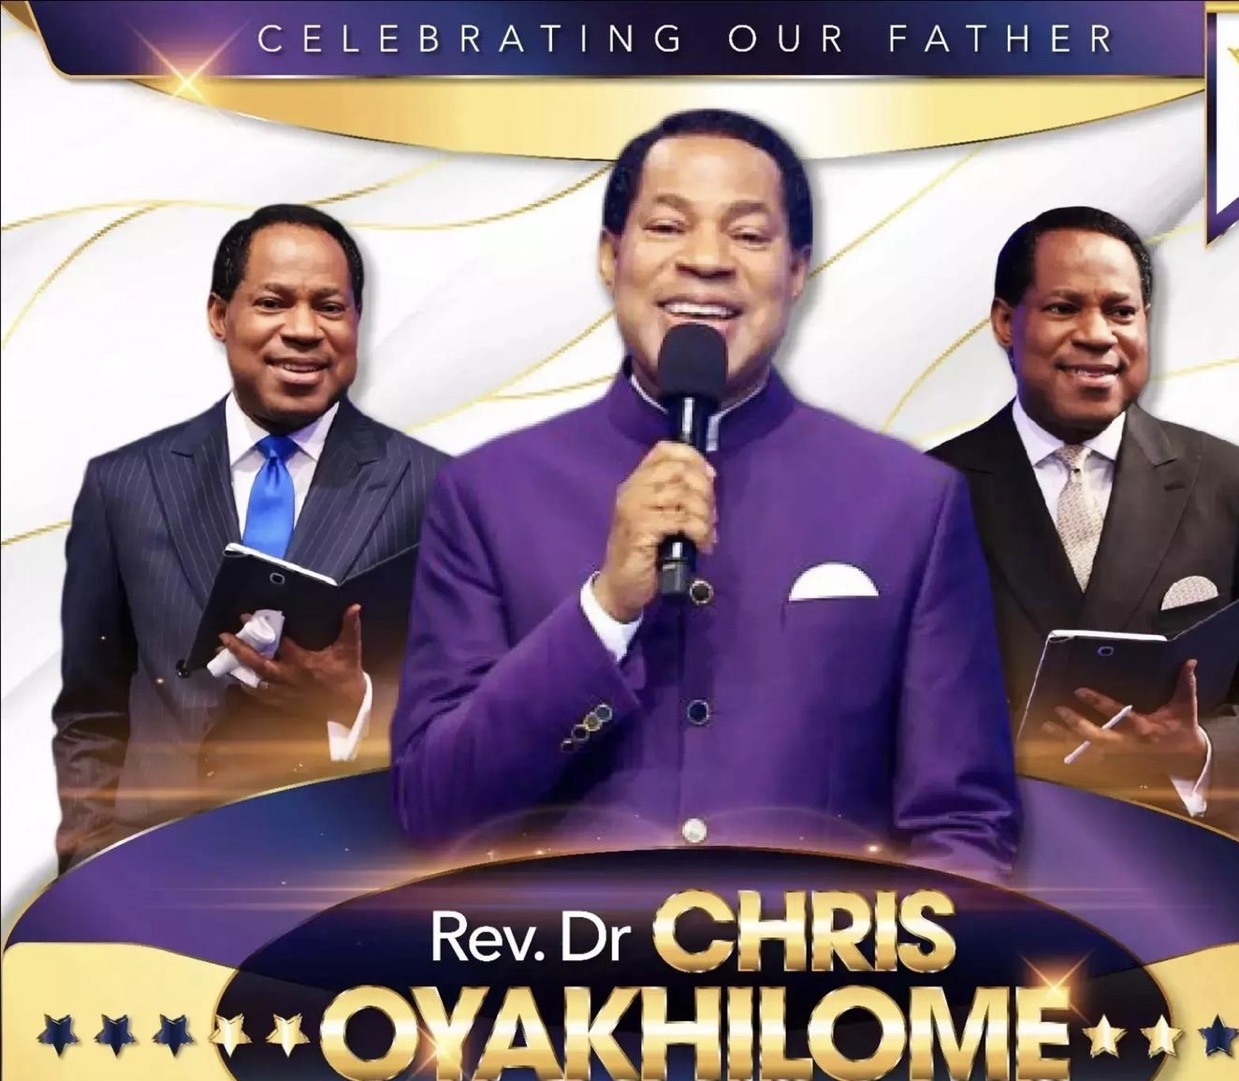 Happy Birthday dear Pastor Chris